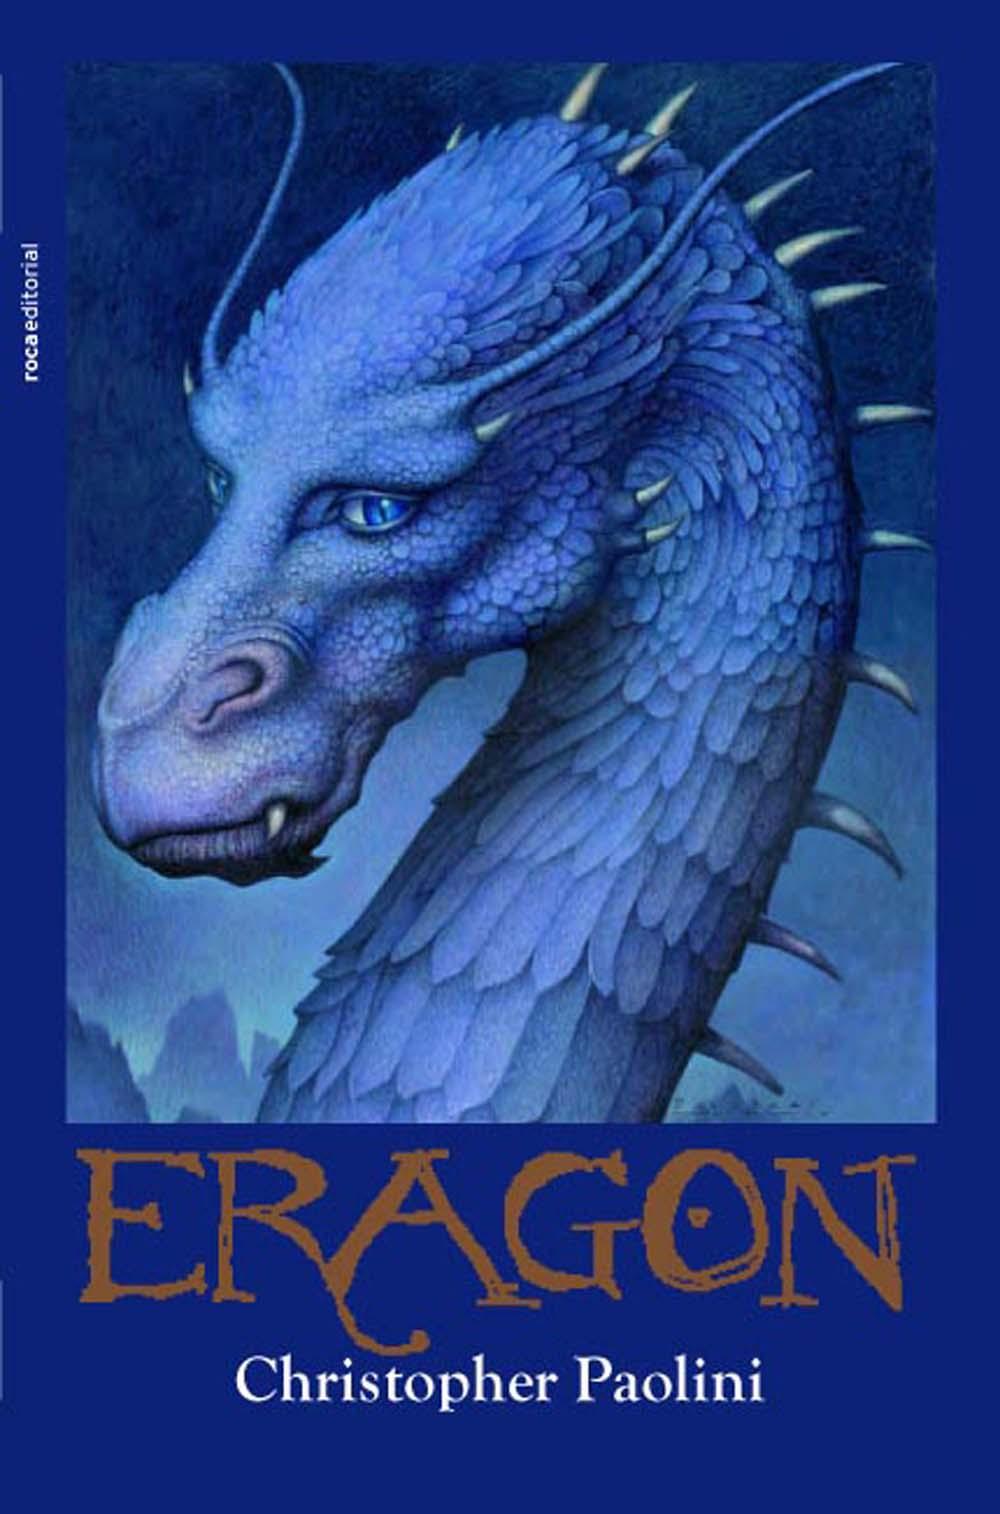 Eragon 5 Geplant